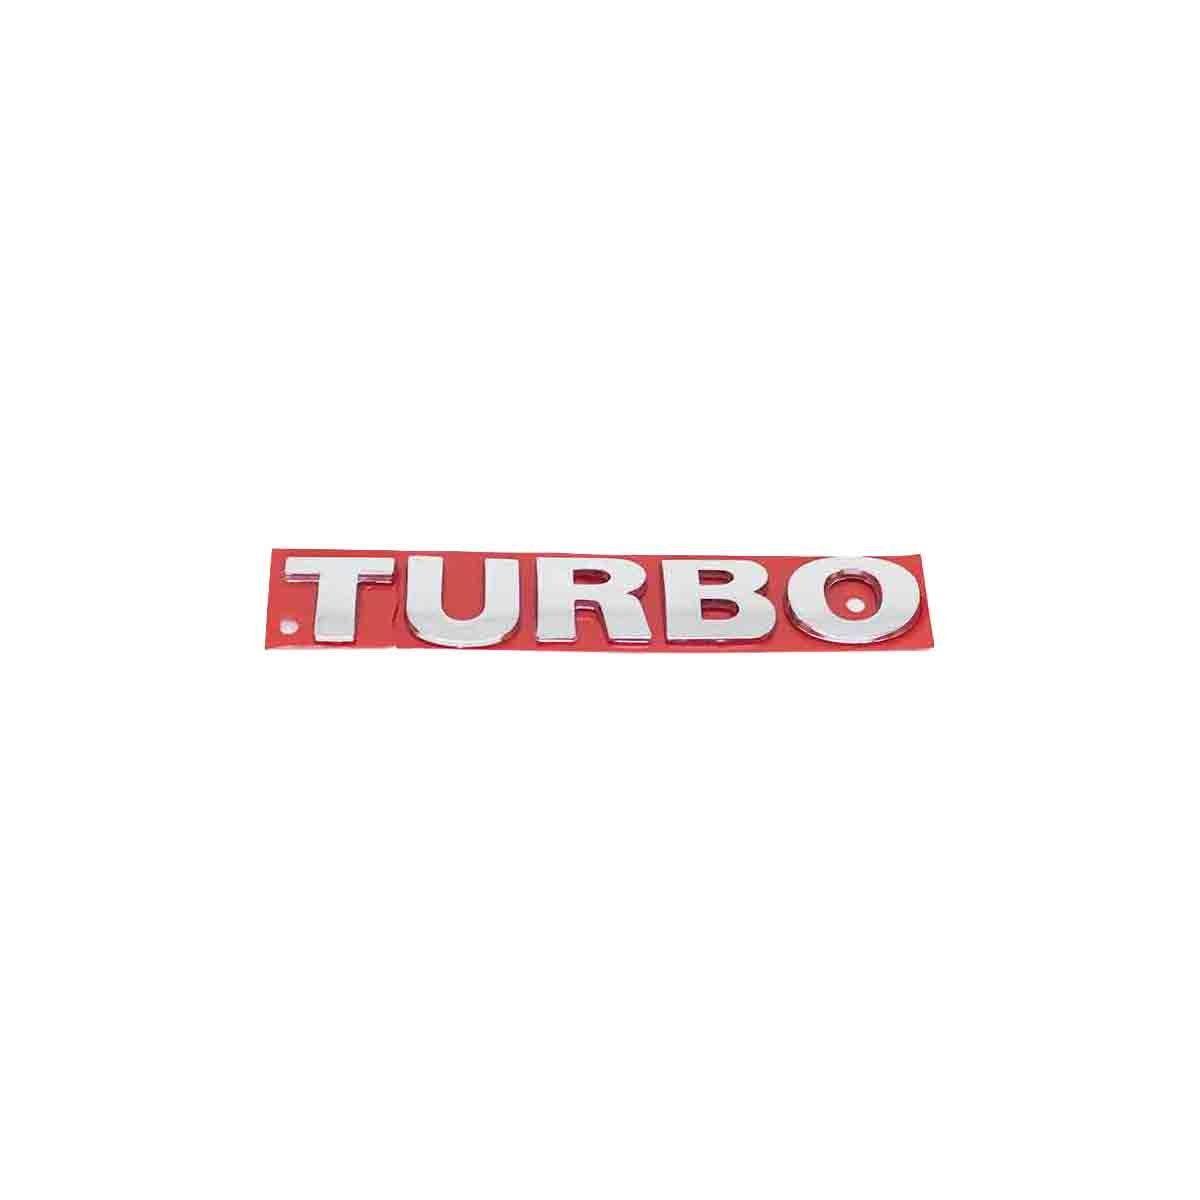 Emblema Turbo VW G3 Cromado